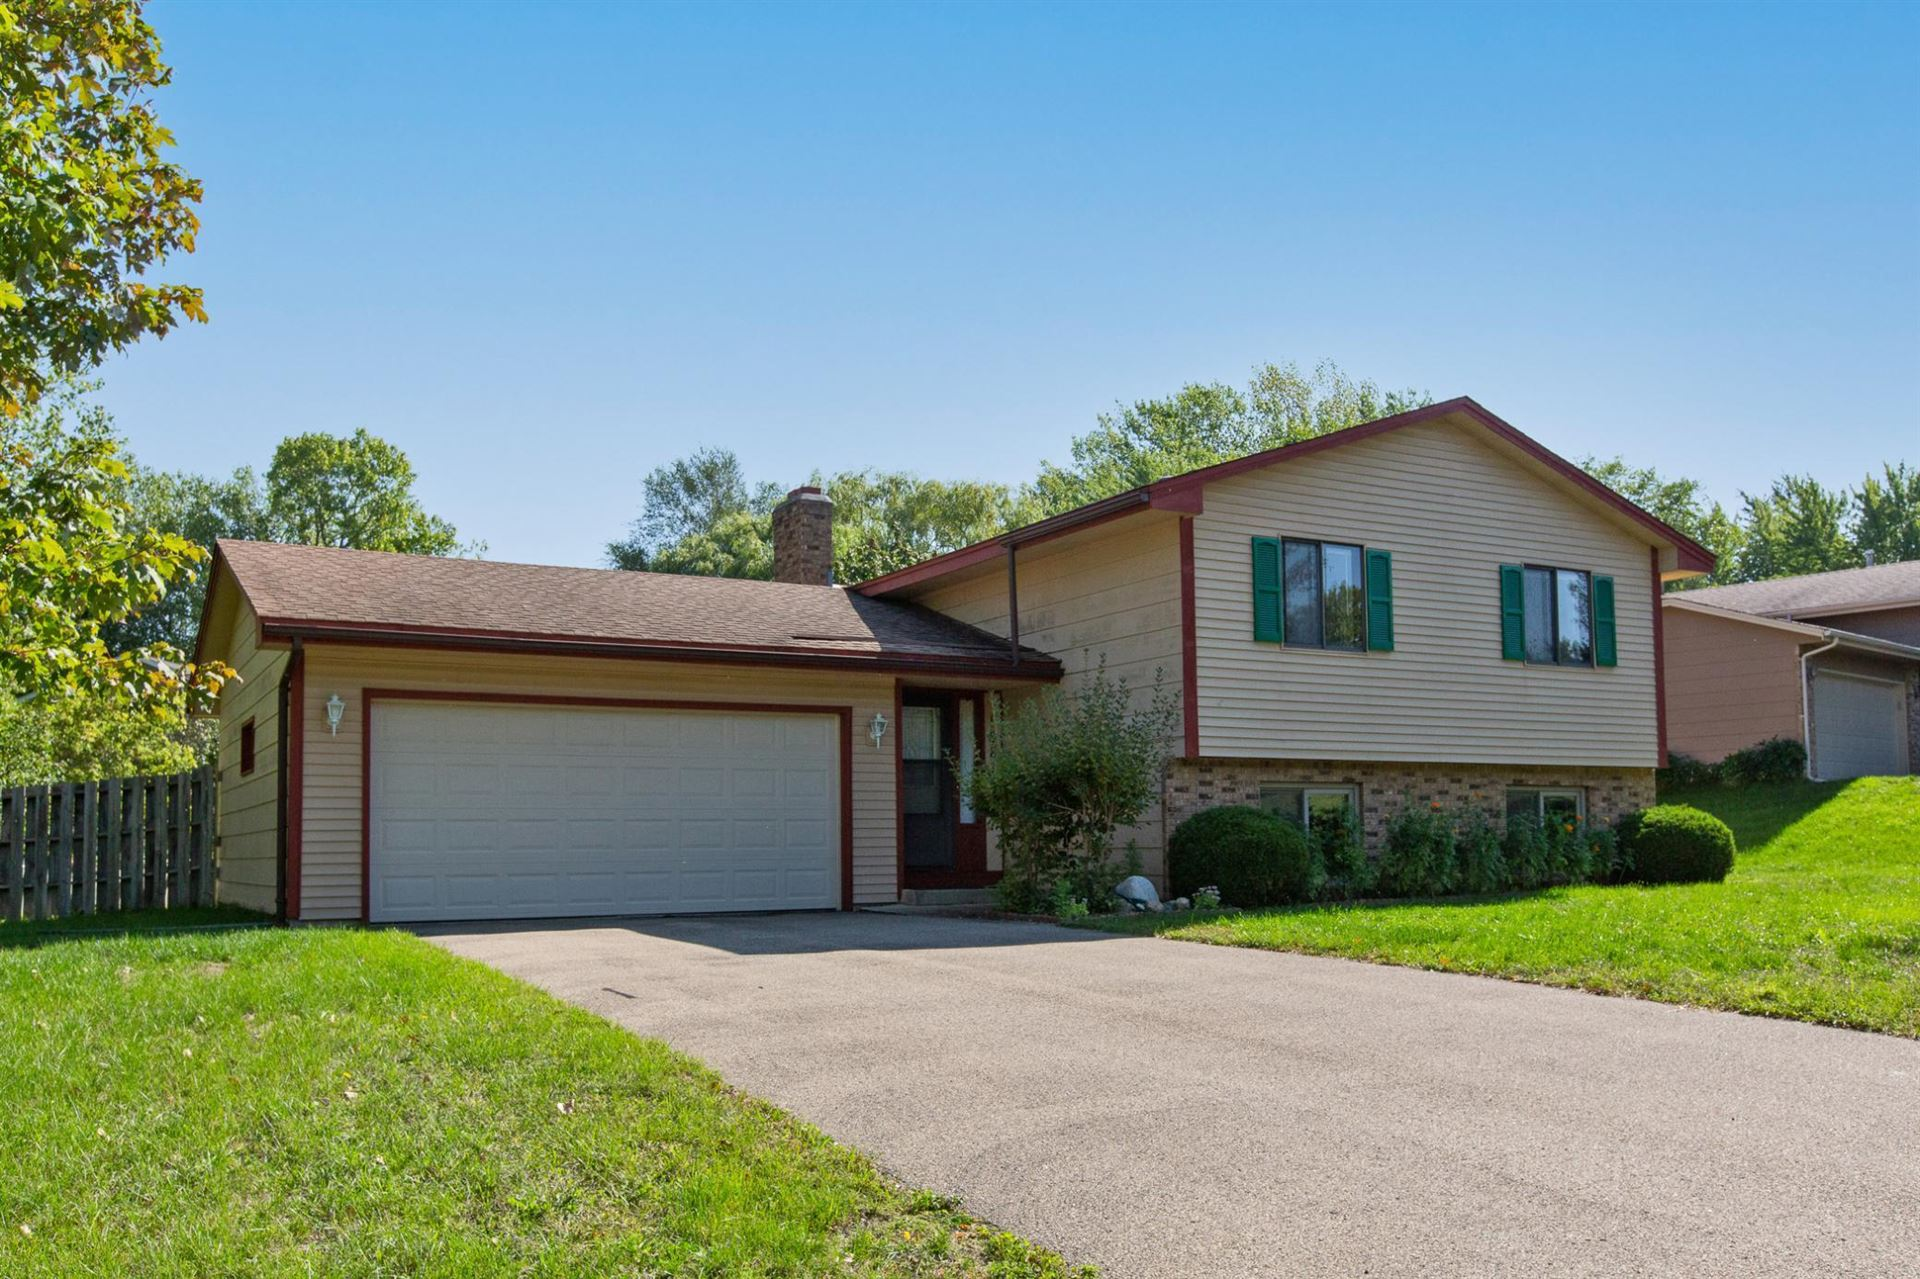 Photo of 16814 Glencoe Avenue, Lakeville, MN 55044 (MLS # 6103861)